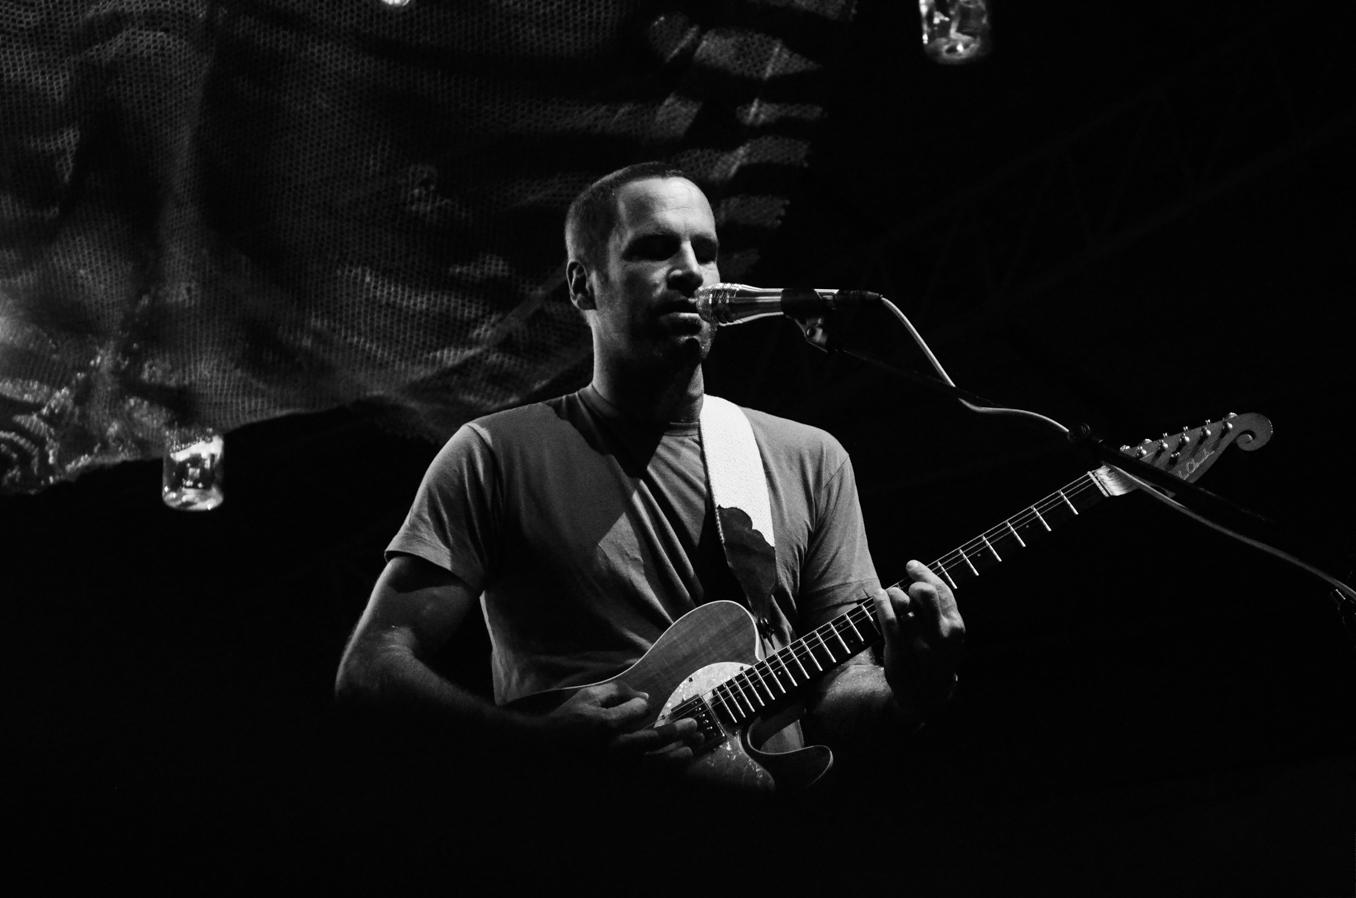 jack johnson live review melbourne photo credit ryley clarke savage thrills savagethrills